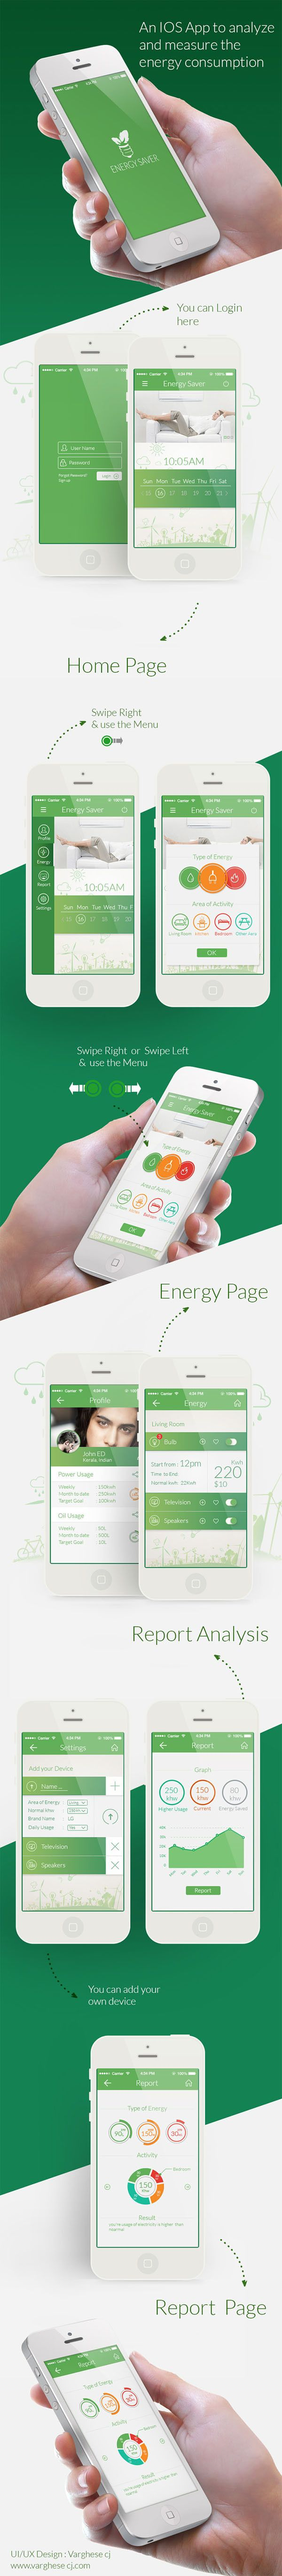 Mobile UI Design Inspiration #20 - Smashfreakz